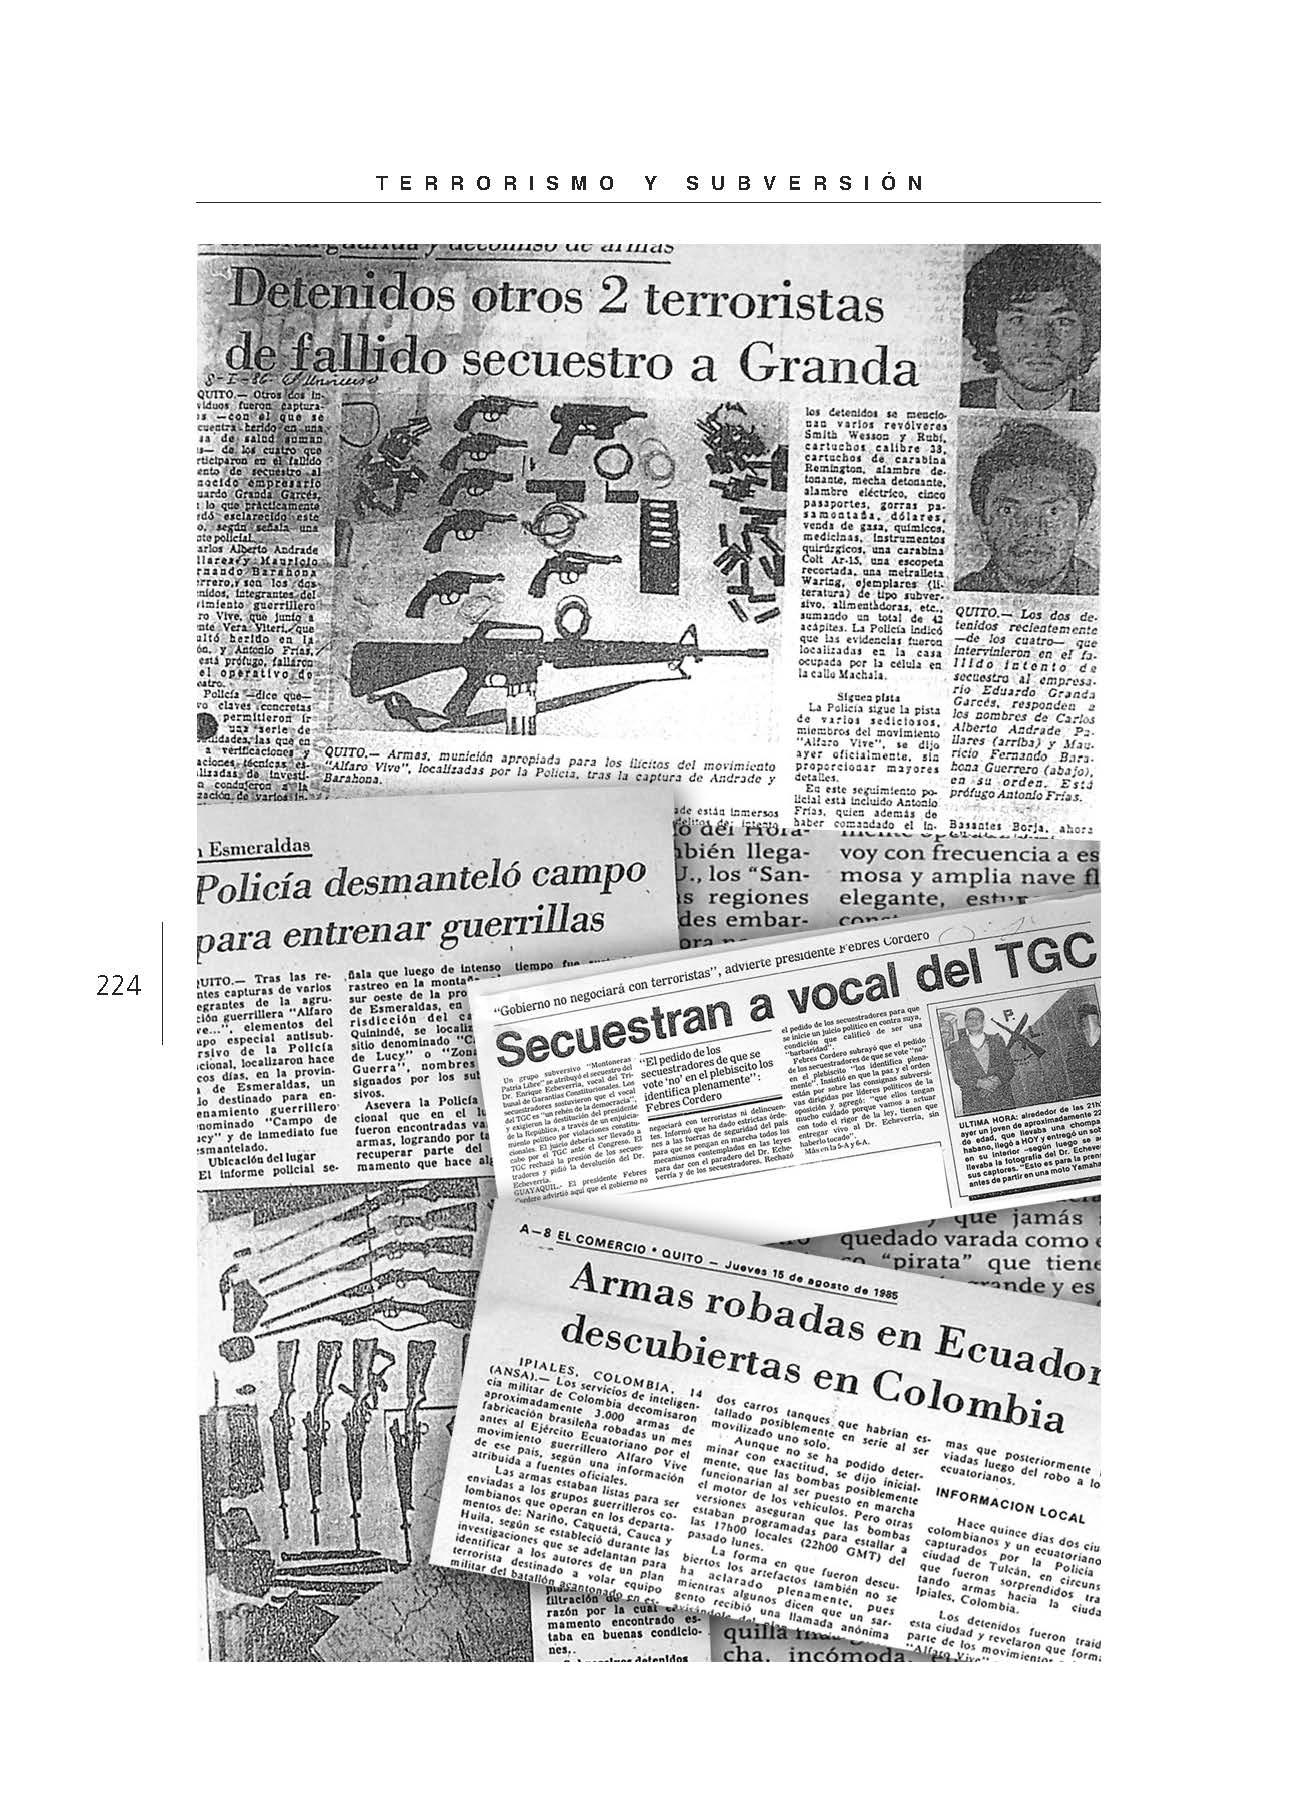 TERRORISMOYSUBVERSIONfotos_Page_07